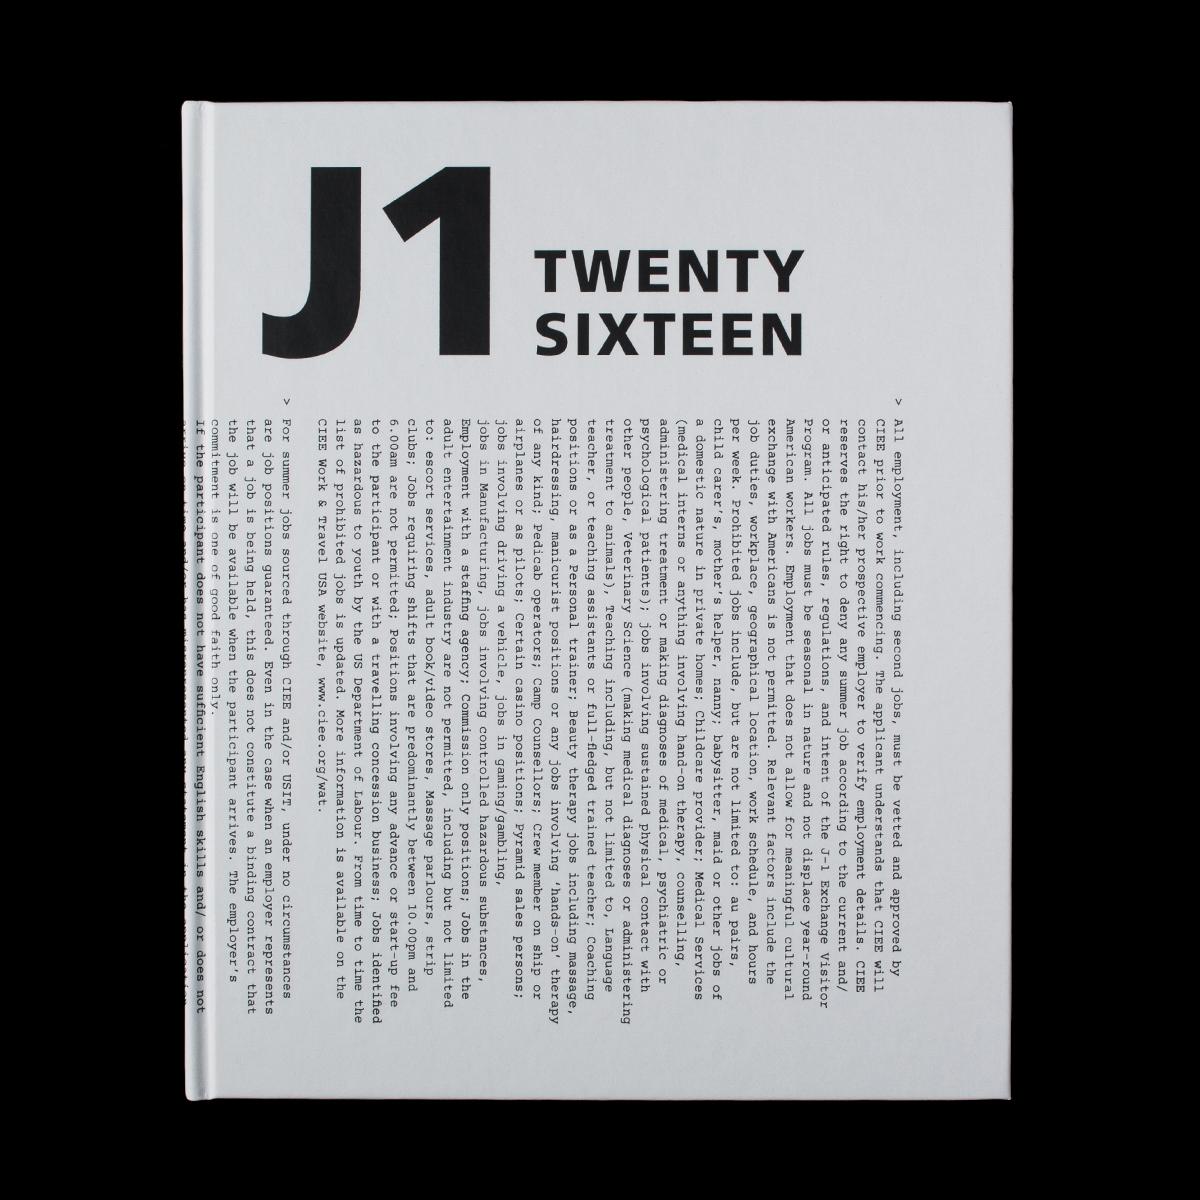 Cover image: J1 Twenty Sixteen